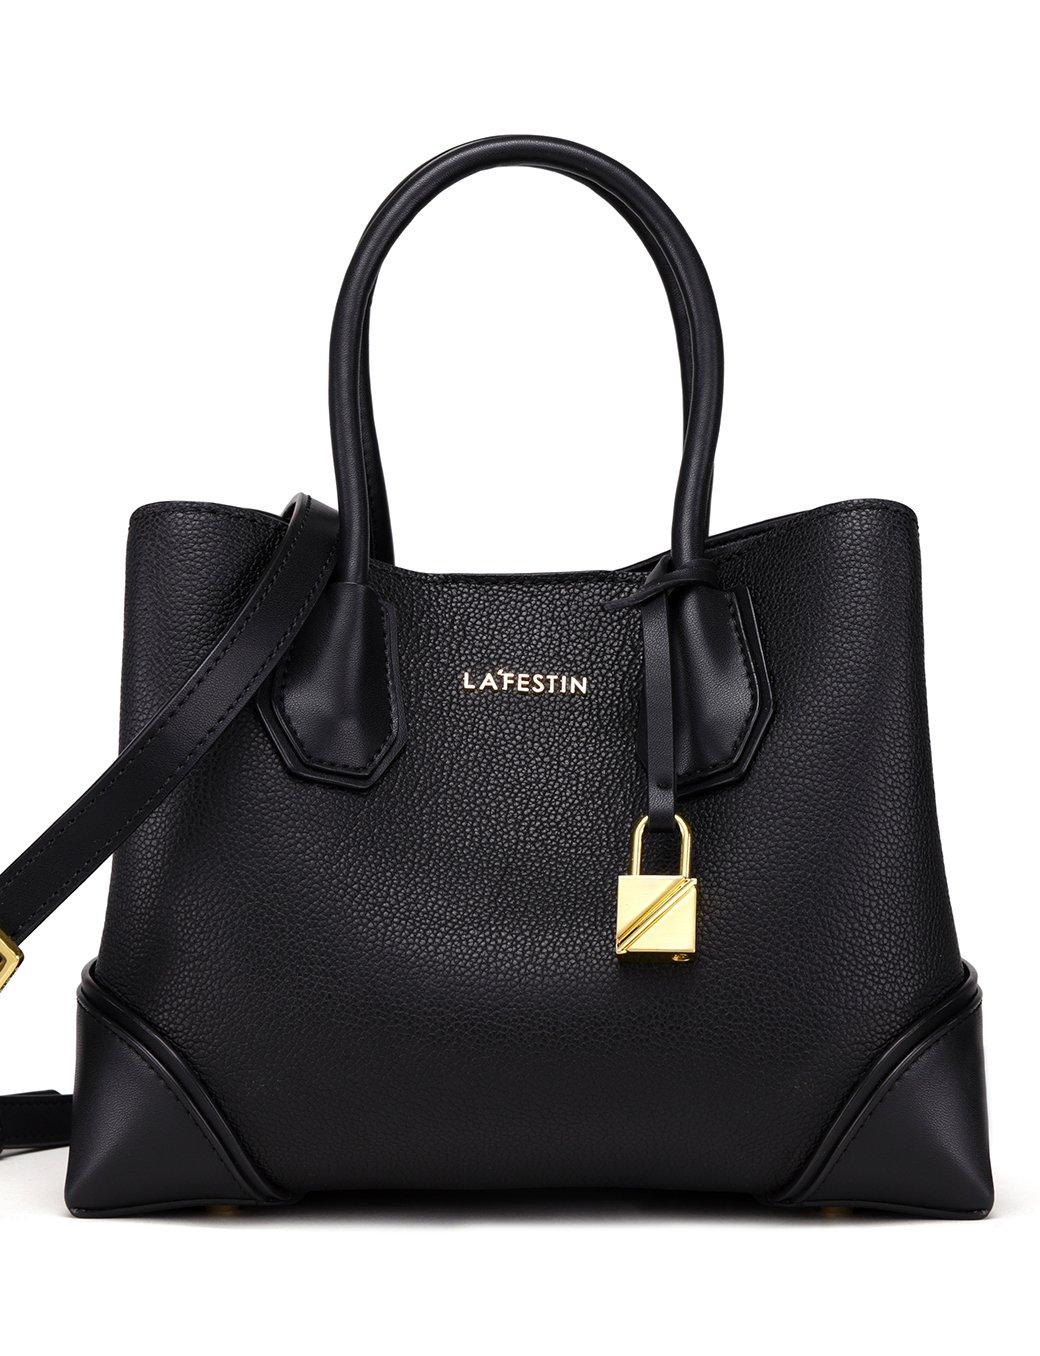 LA'FESTIN Women's Designer Leather Kelly Bags with Cross-body Shoulder Strap Black Purses and Handbags